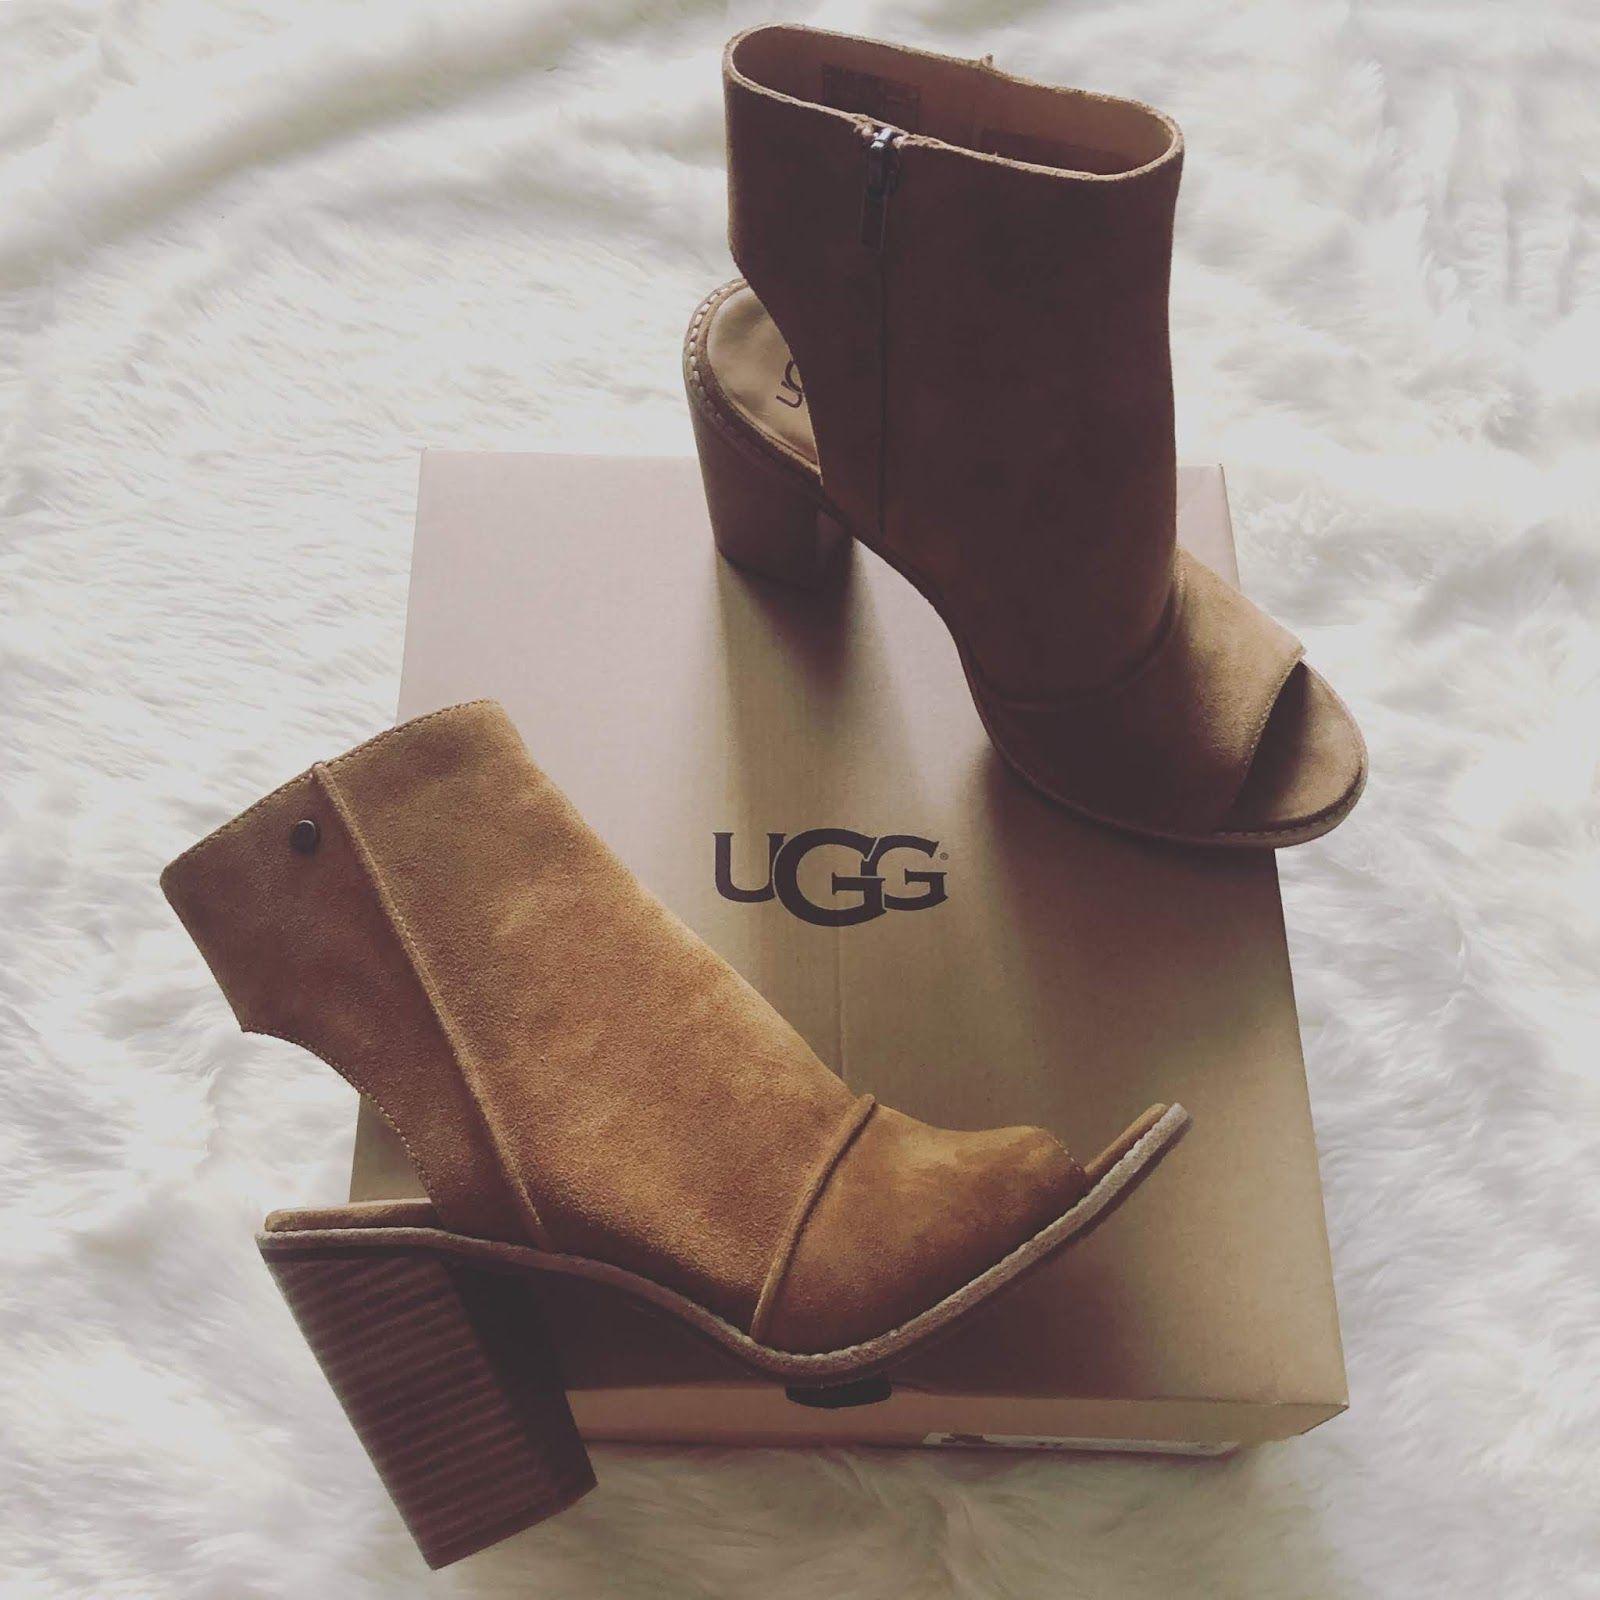 438a2d6ee1d UGG Valencia Peep Toe Bootie | Boots | Peep toe, Uggs, Peeps